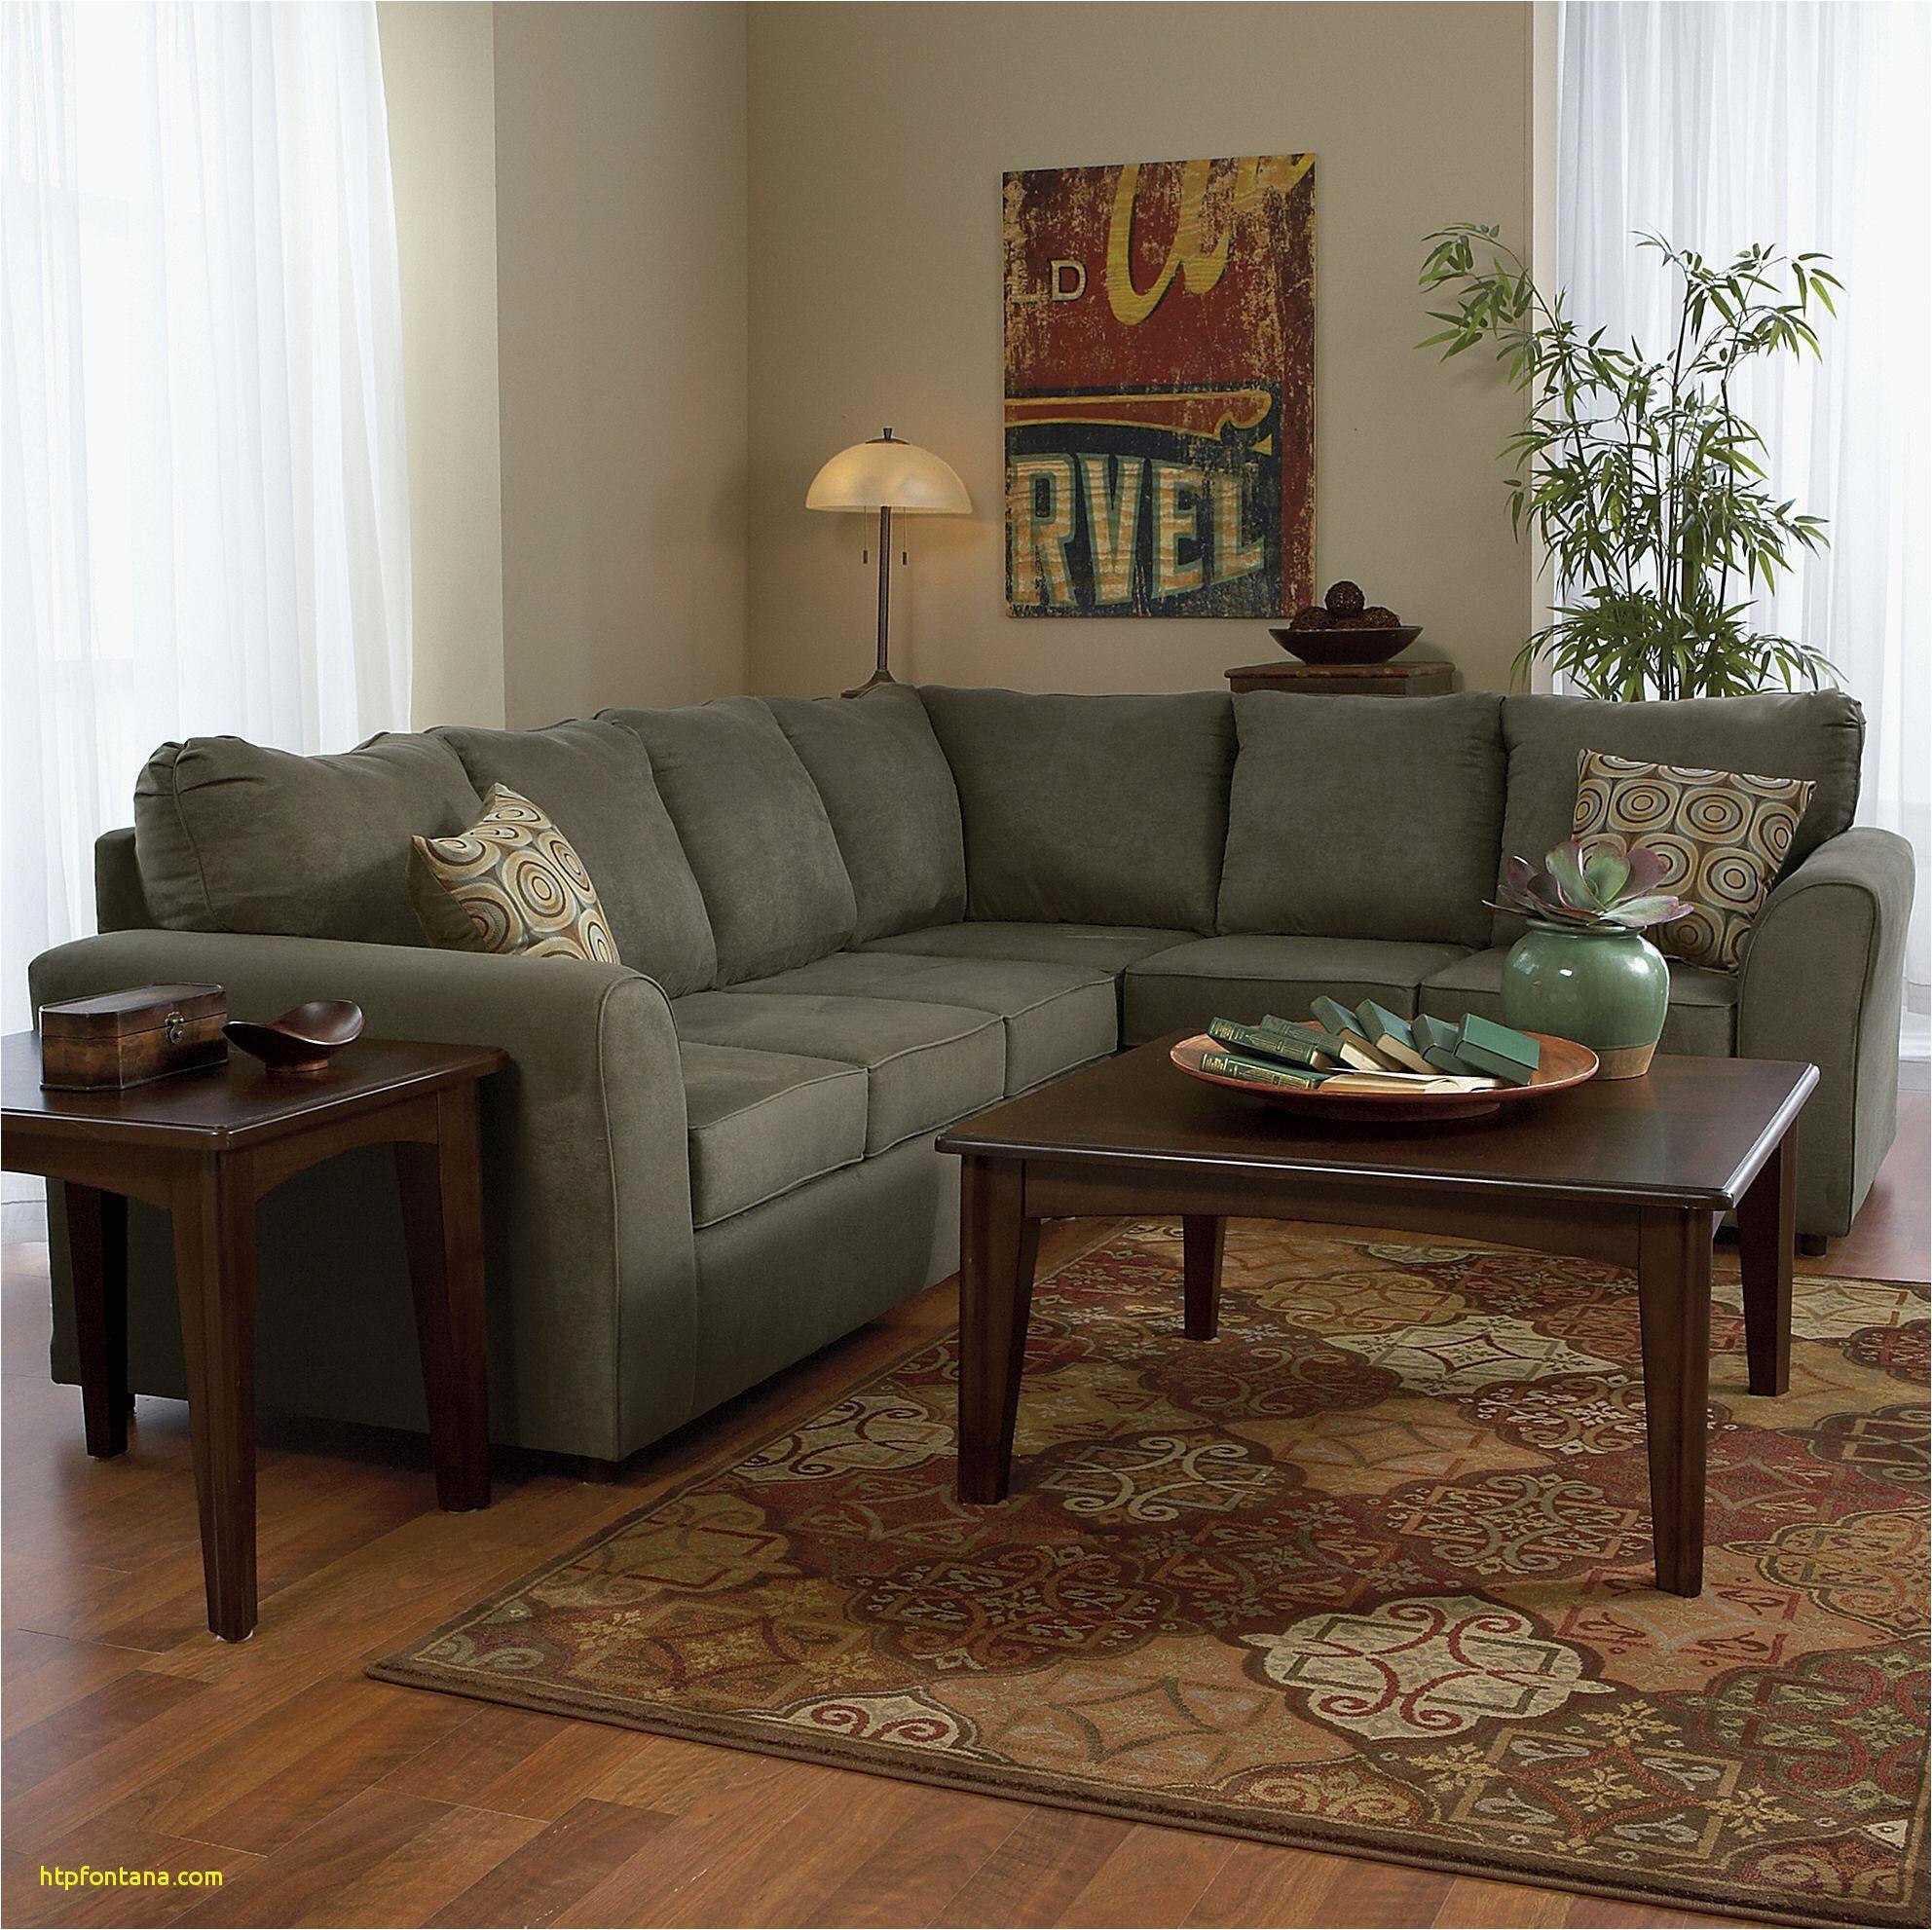 badcock home furniture and more fresh 21 fresh badcock living room furniture photograph of badcock home